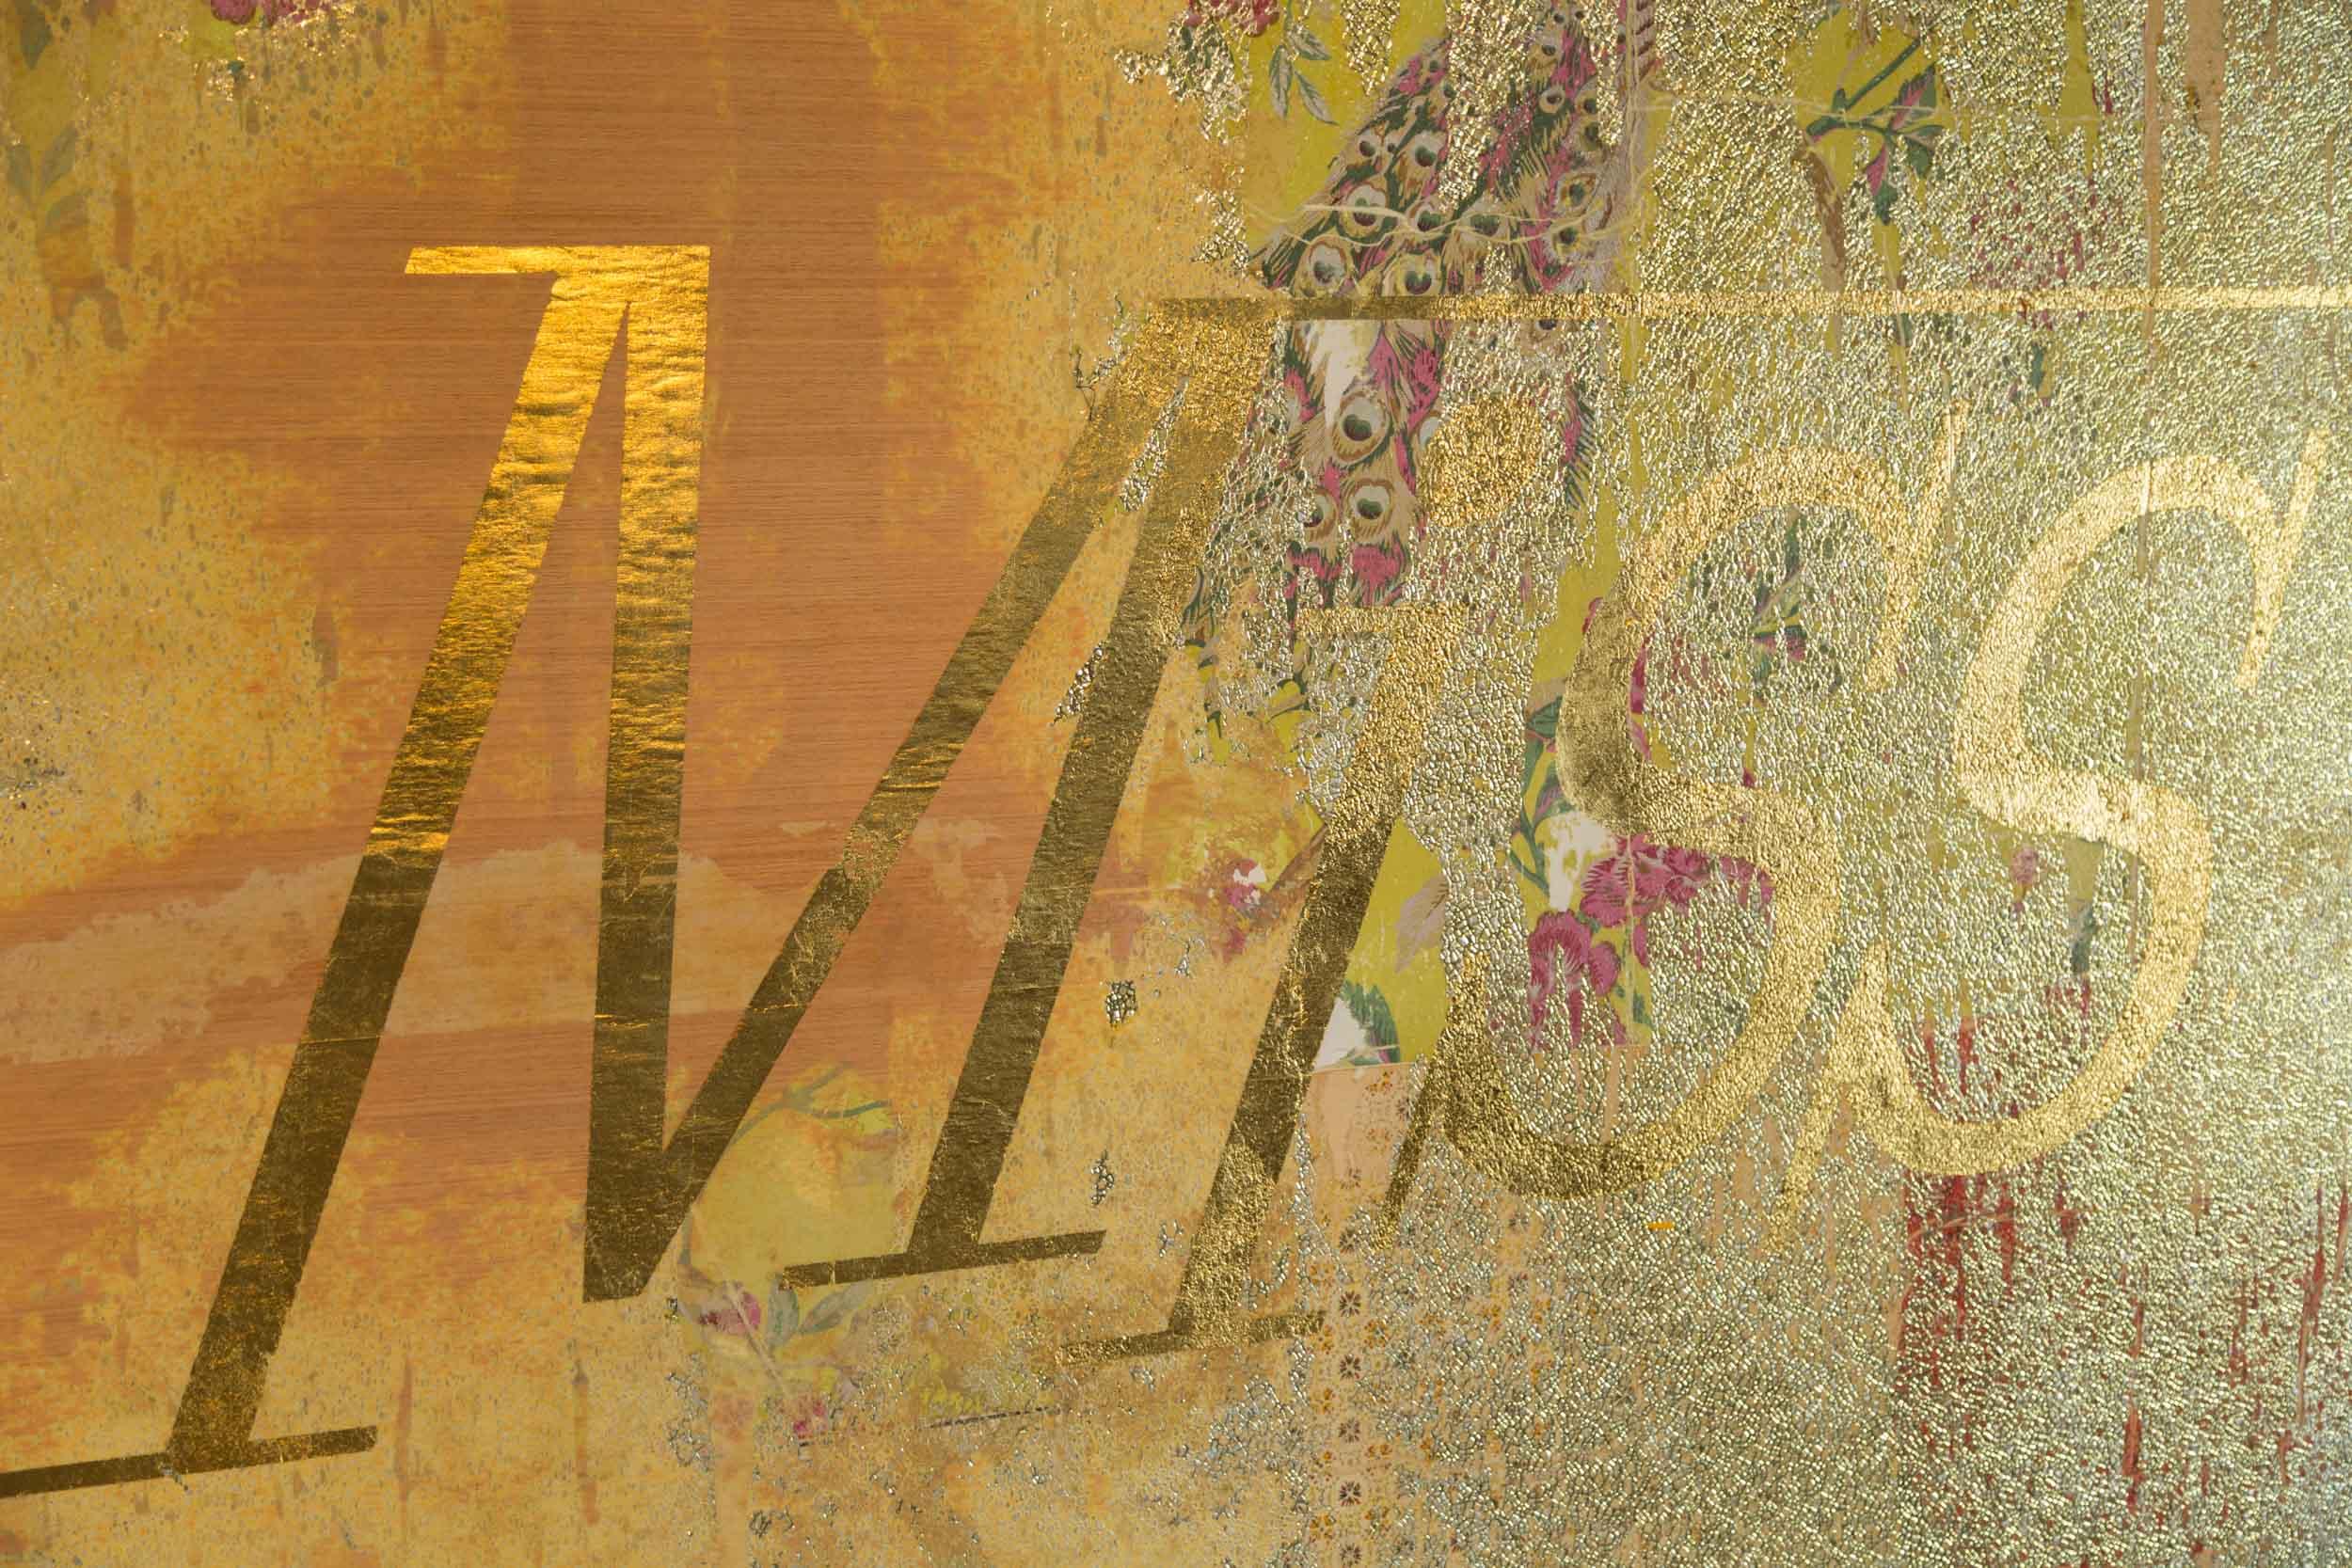 wassaic-project-exhibition-change-of-state-2018-08-03-15-54-08.jpg